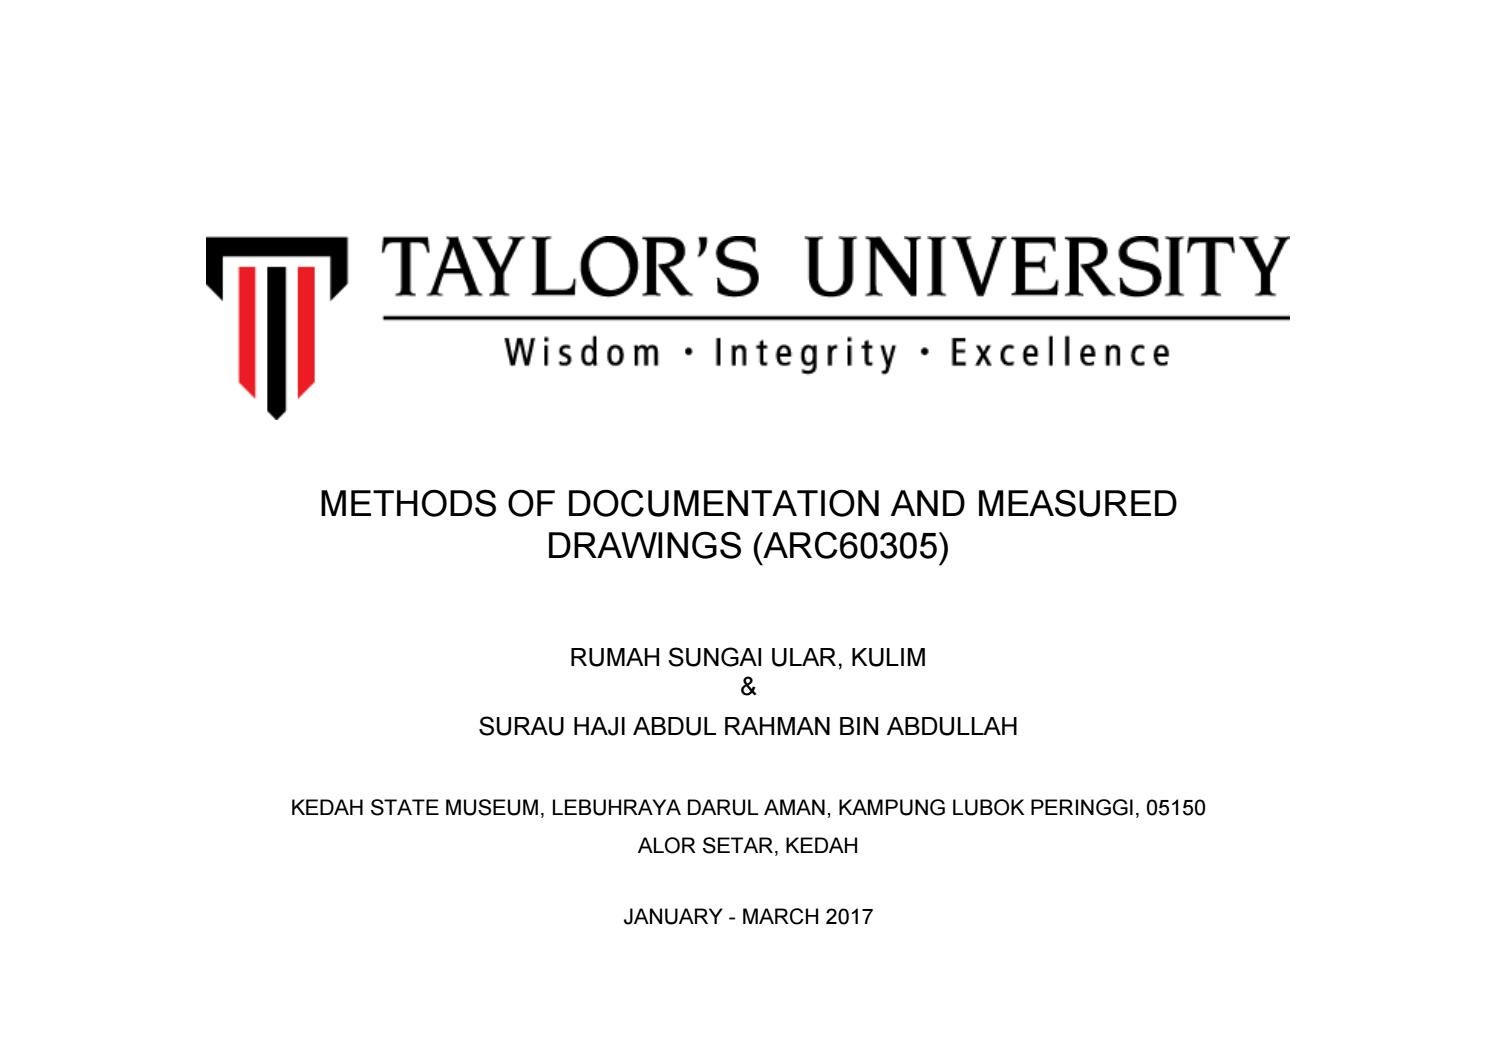 Kedah report kedah house surau by mirza qayyum issuu ccuart Gallery